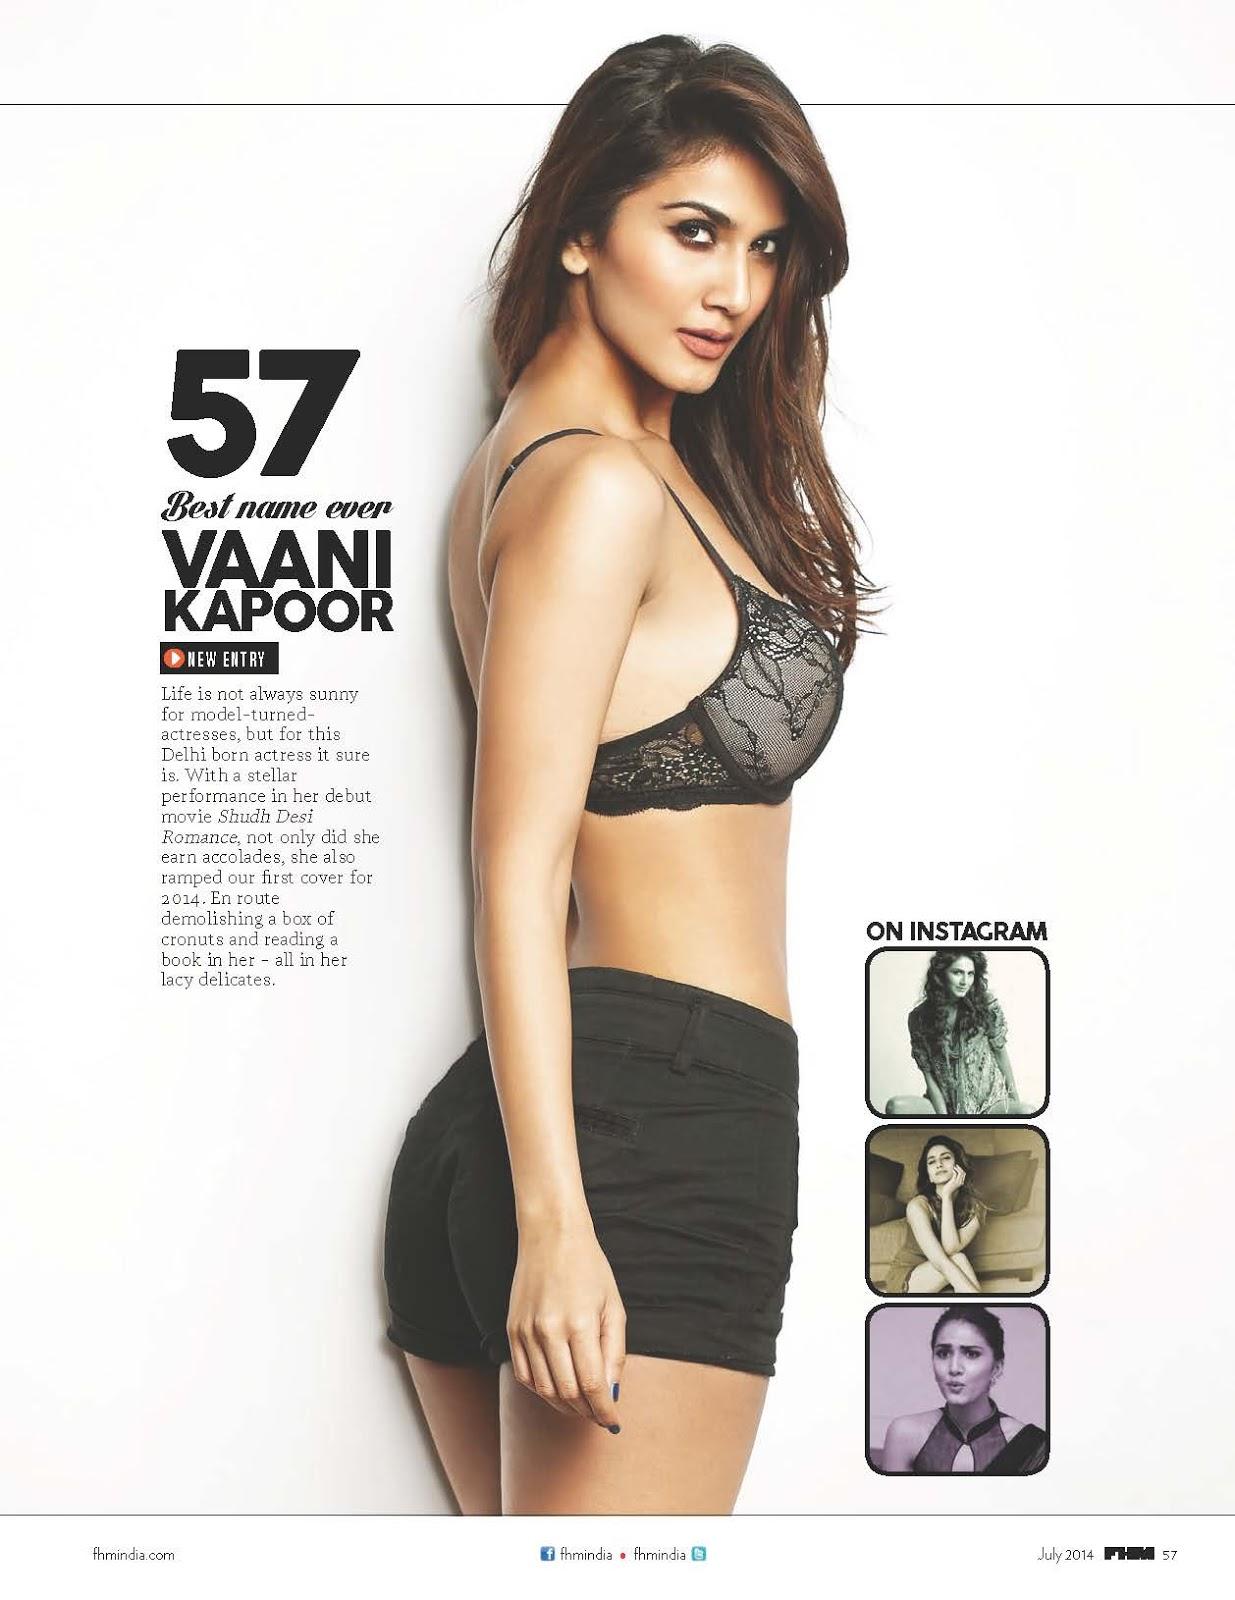 Sexiest Vani Kapoor photo